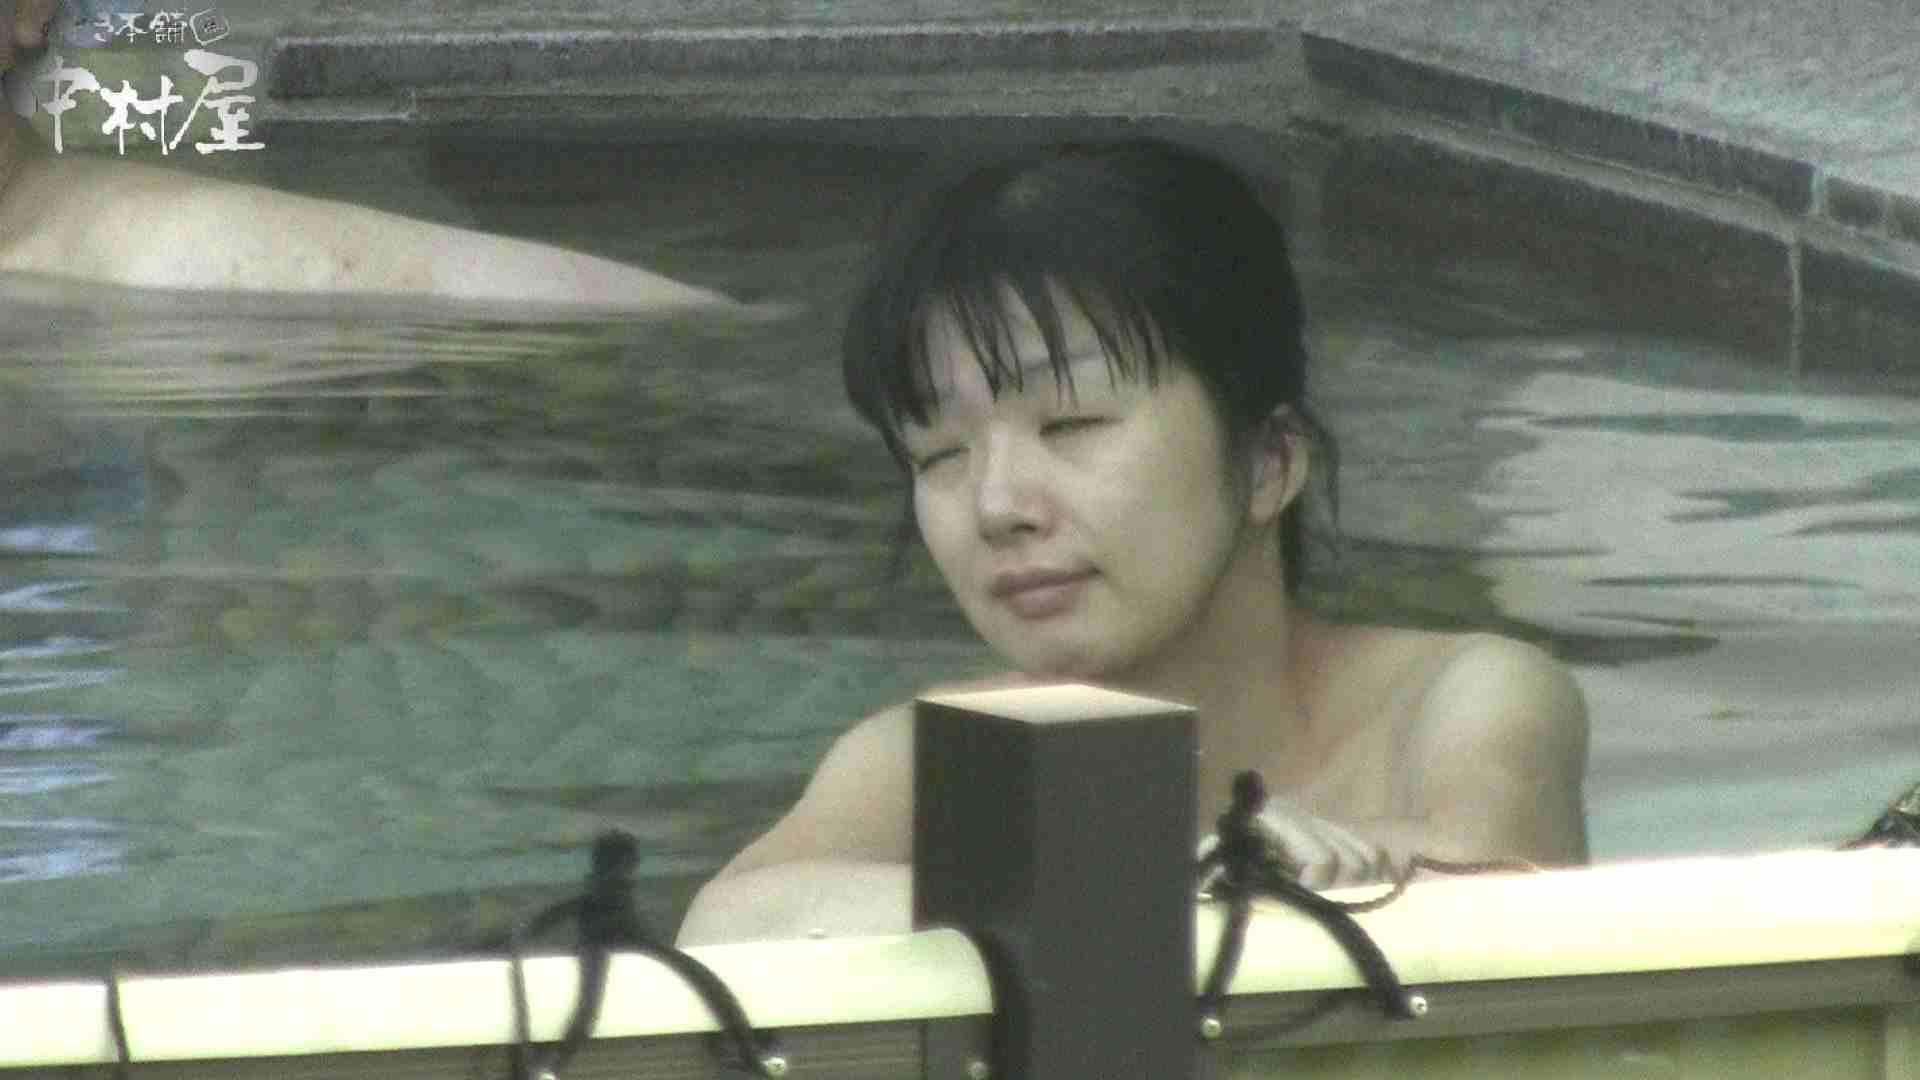 Aquaな露天風呂Vol.904 盗撮師作品  103pic 45